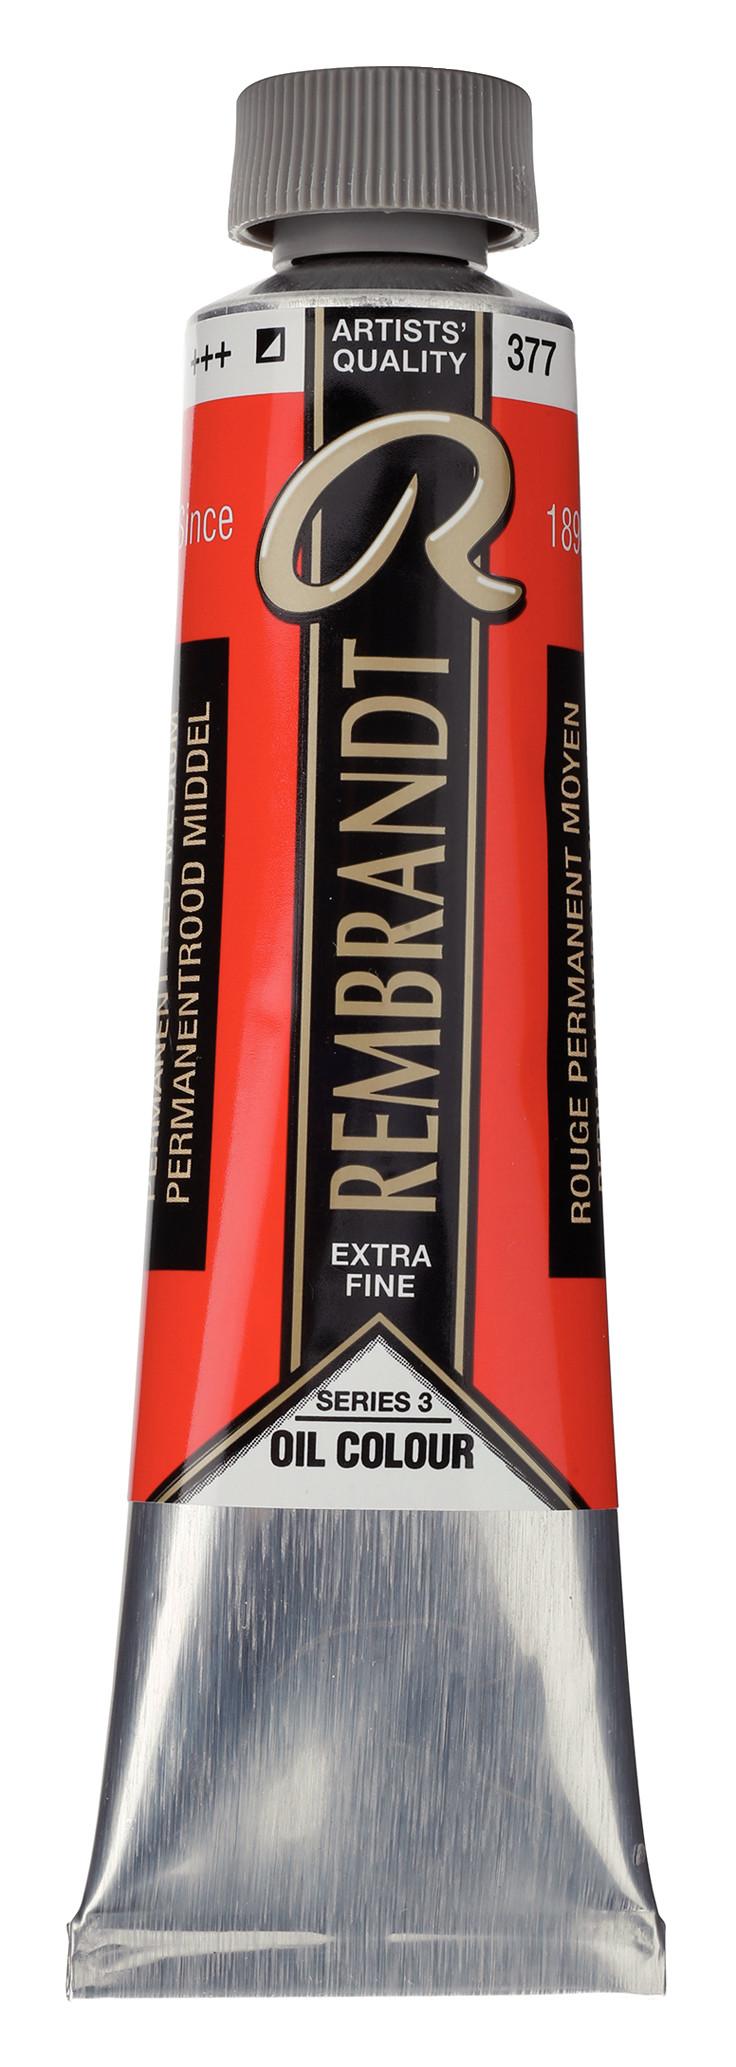 Rembrandt Oil colour Paint Permanent Red Medium (377) 40ml Tube